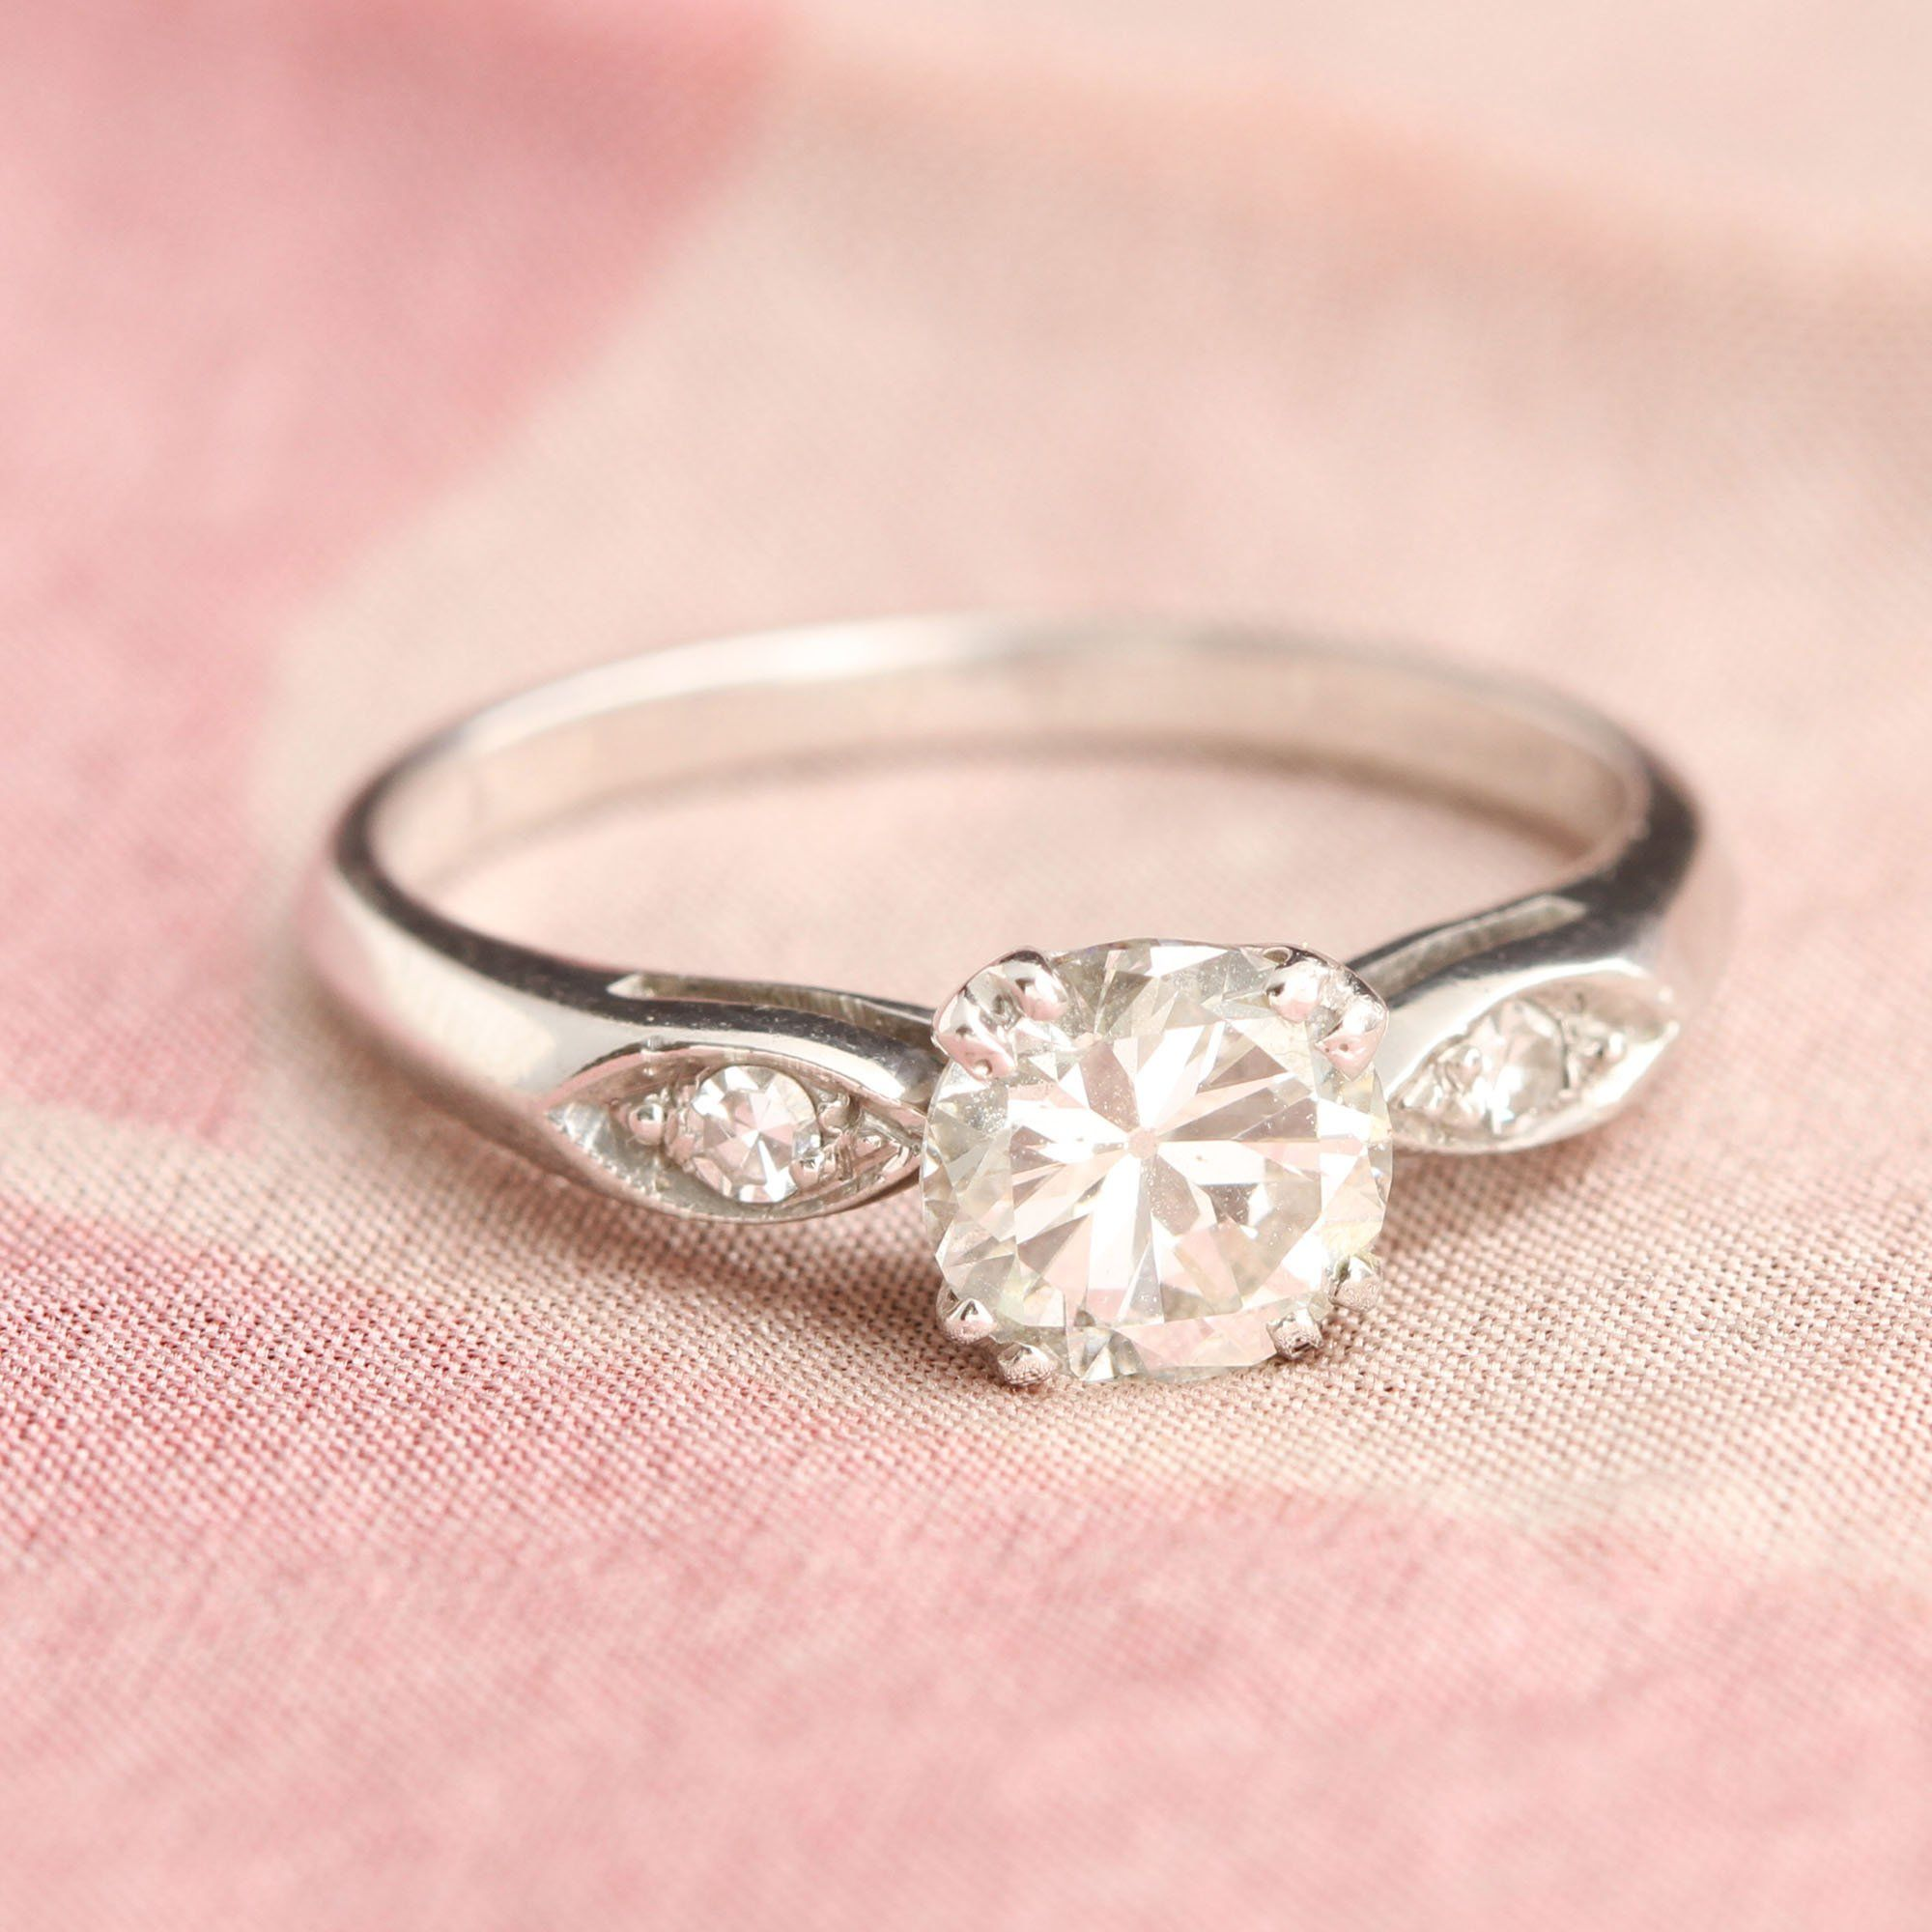 Platinum .84ct Old European Cut Diamond Engagement Ring with Petal Shoulders